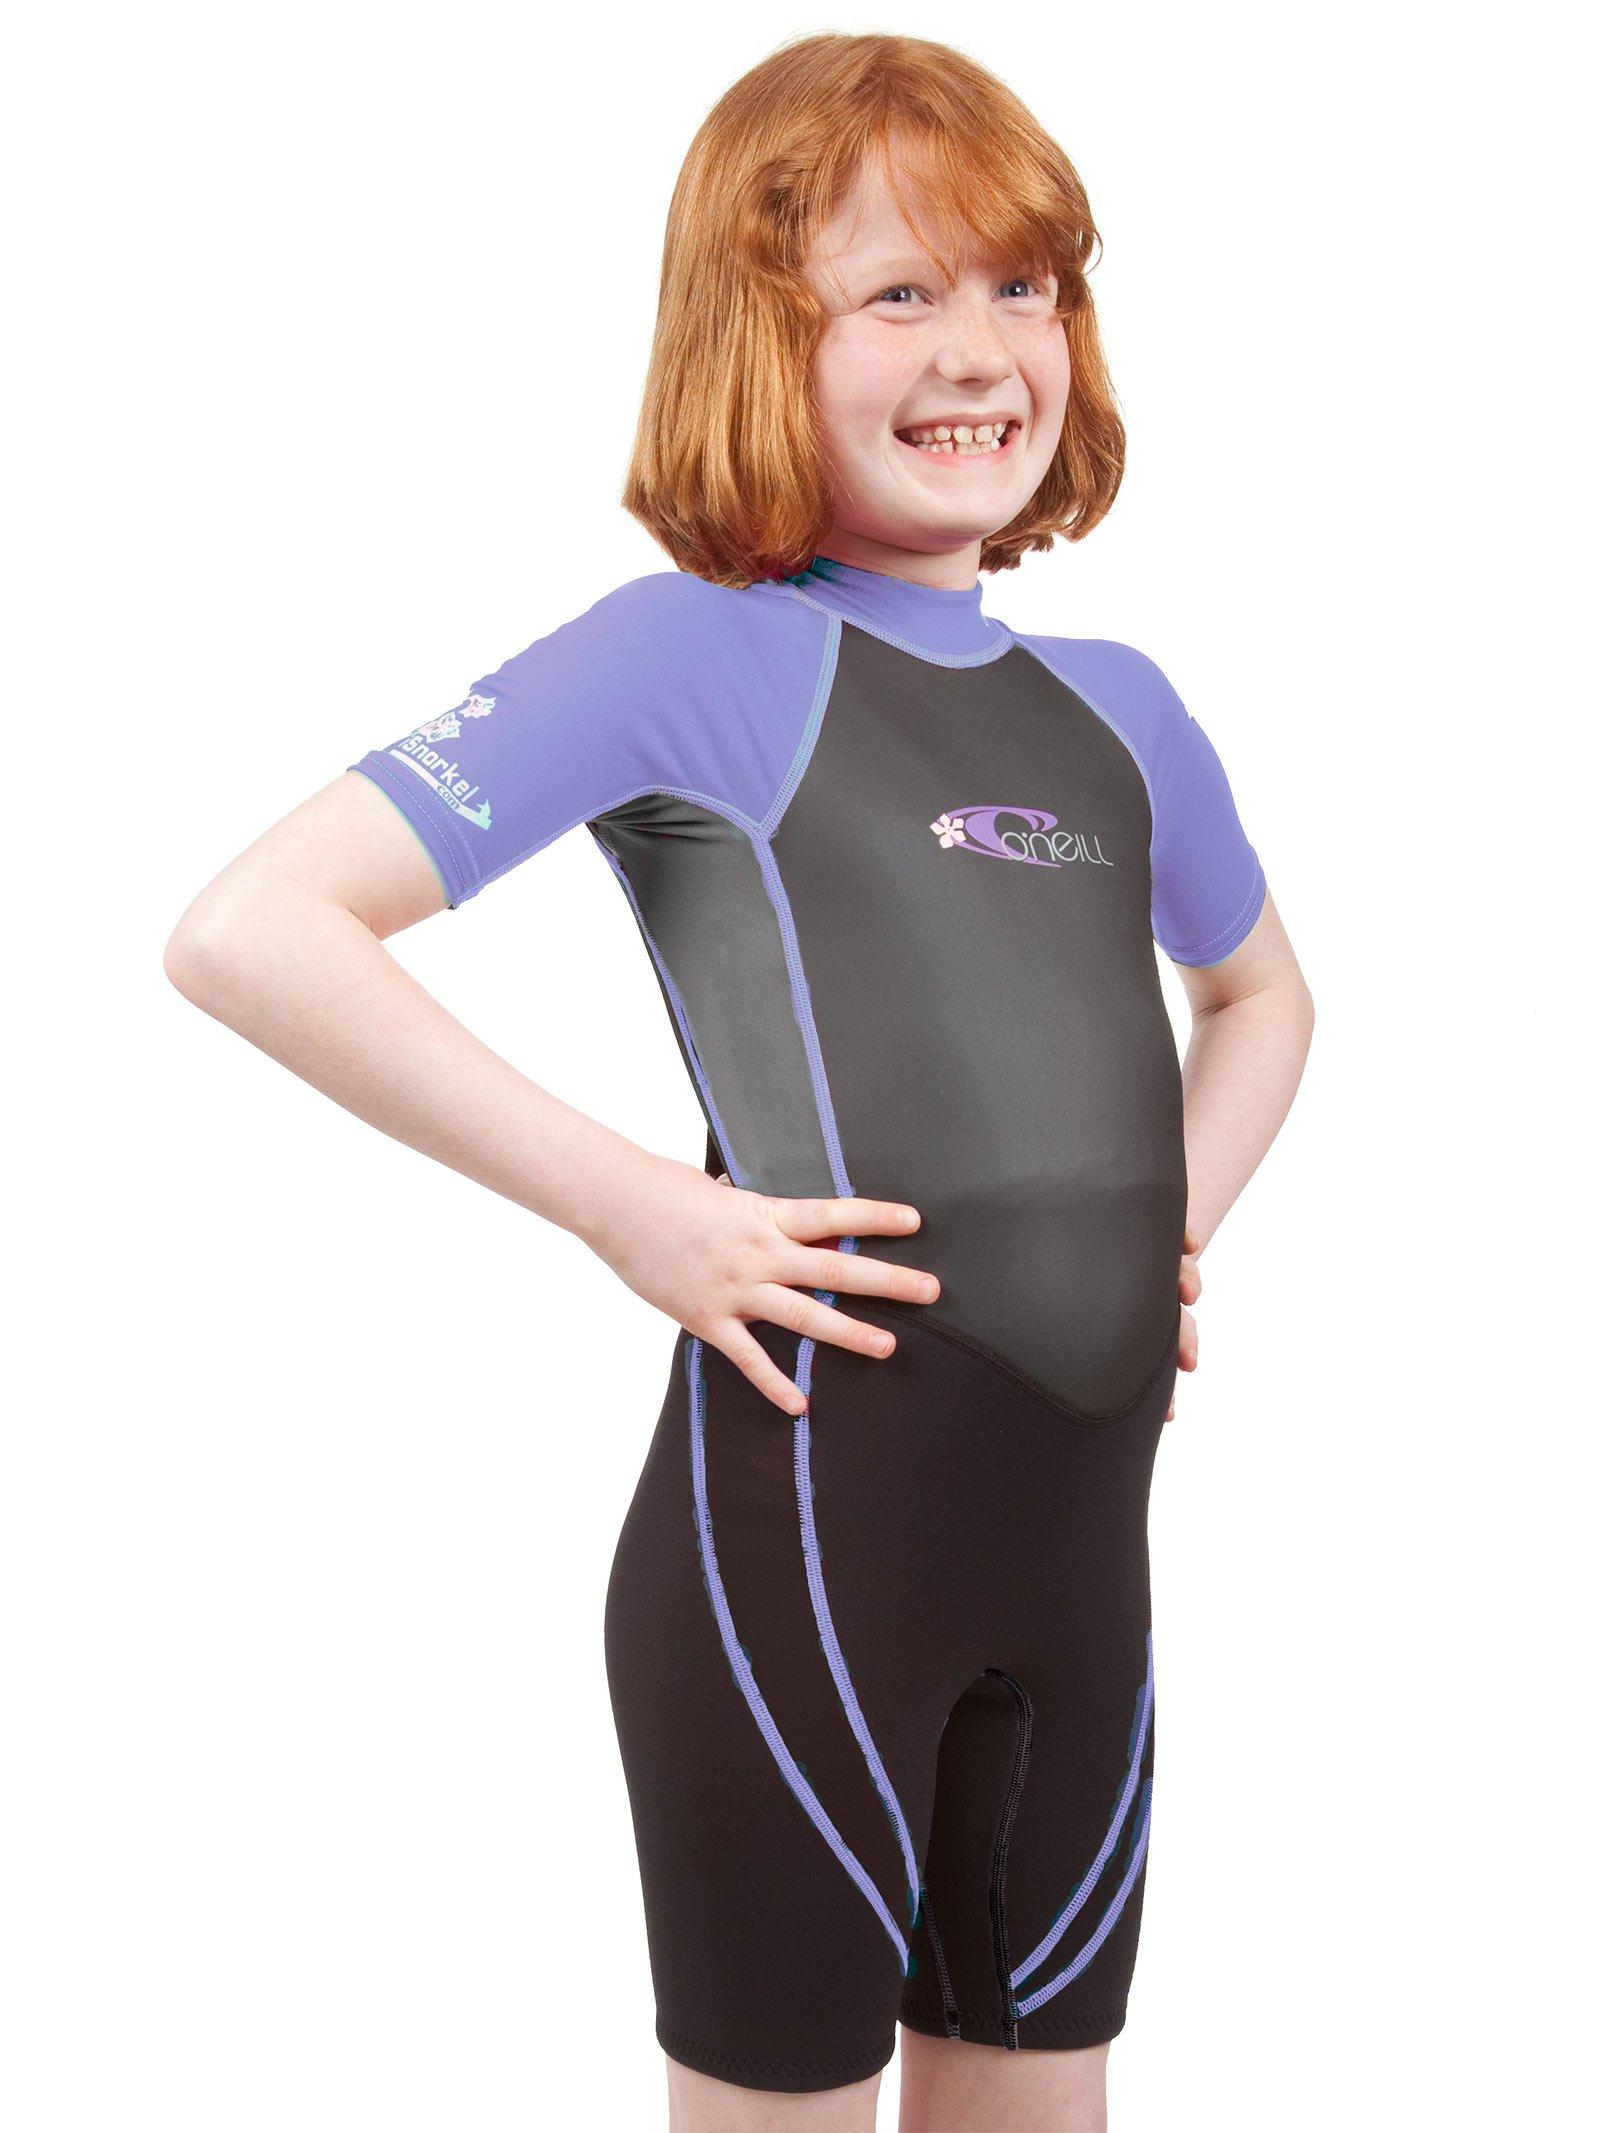 O'Neill Reactor Hybrid Kids Shorty Wetsuit 4 Black/Smoke/Lilac